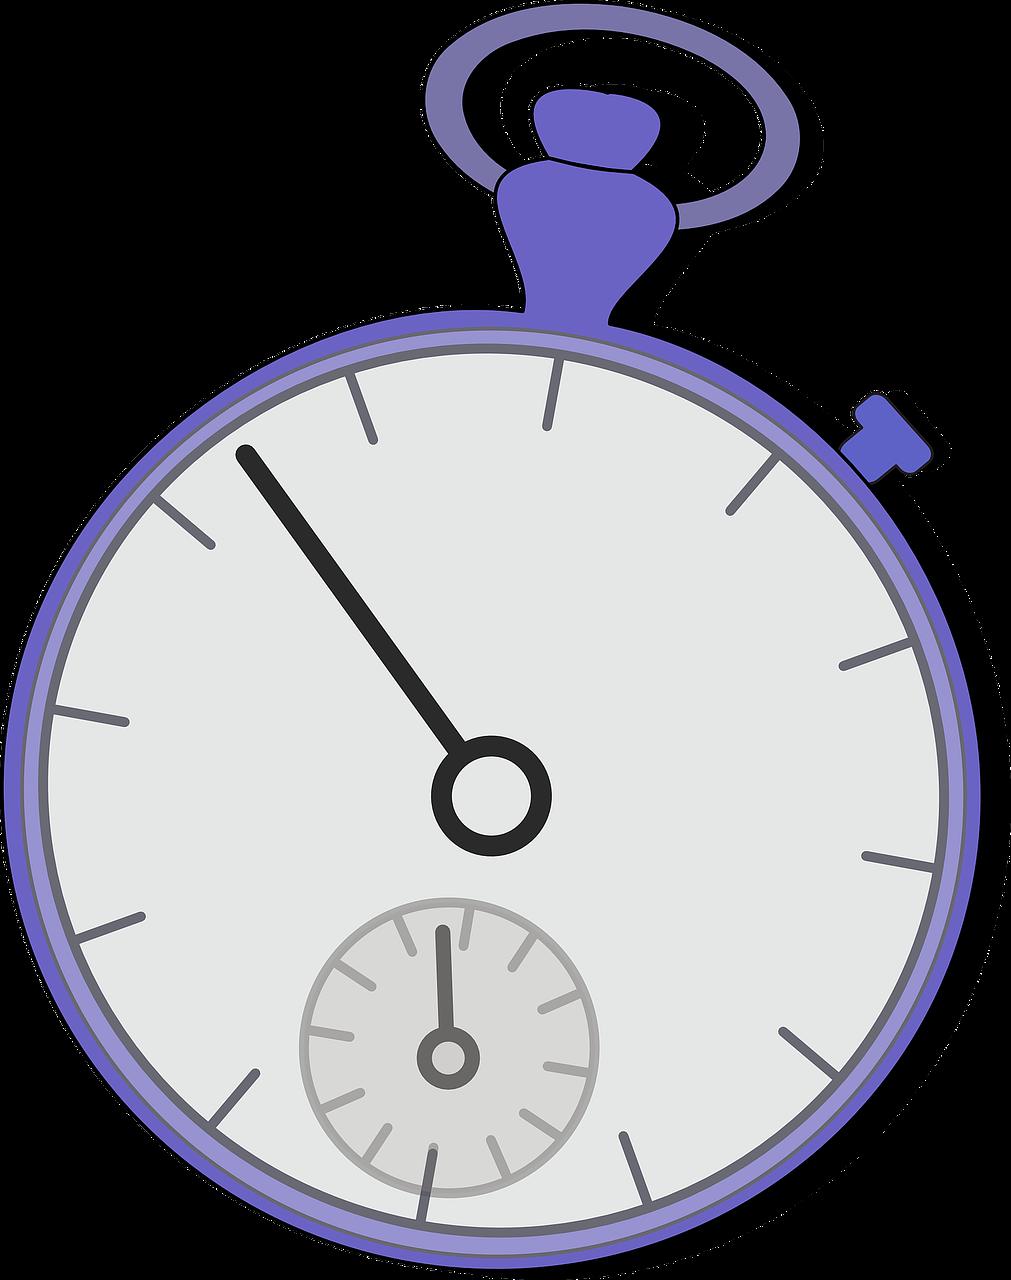 Stopwatch clipart reading. Jota countdown k bsa